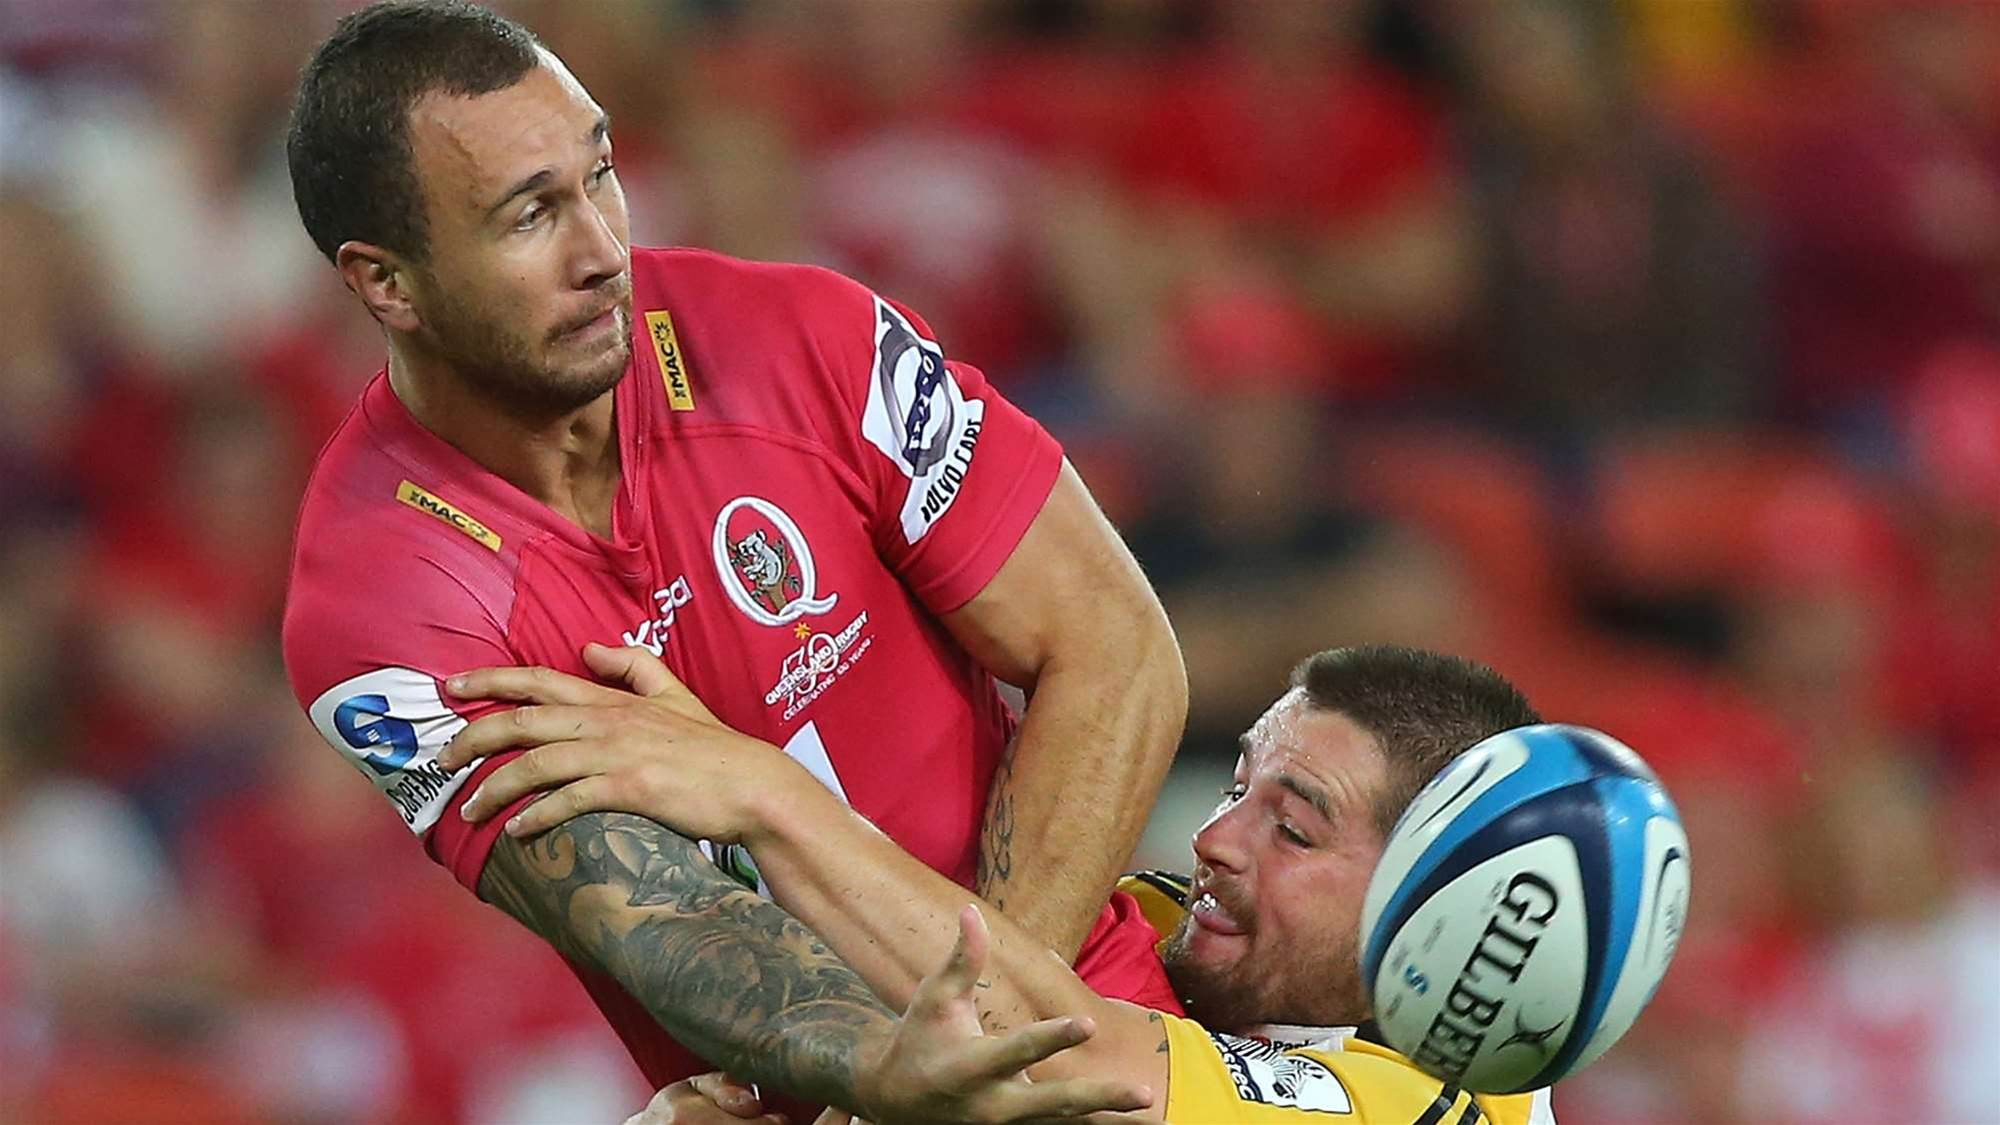 Cooper decides Super Rugby future